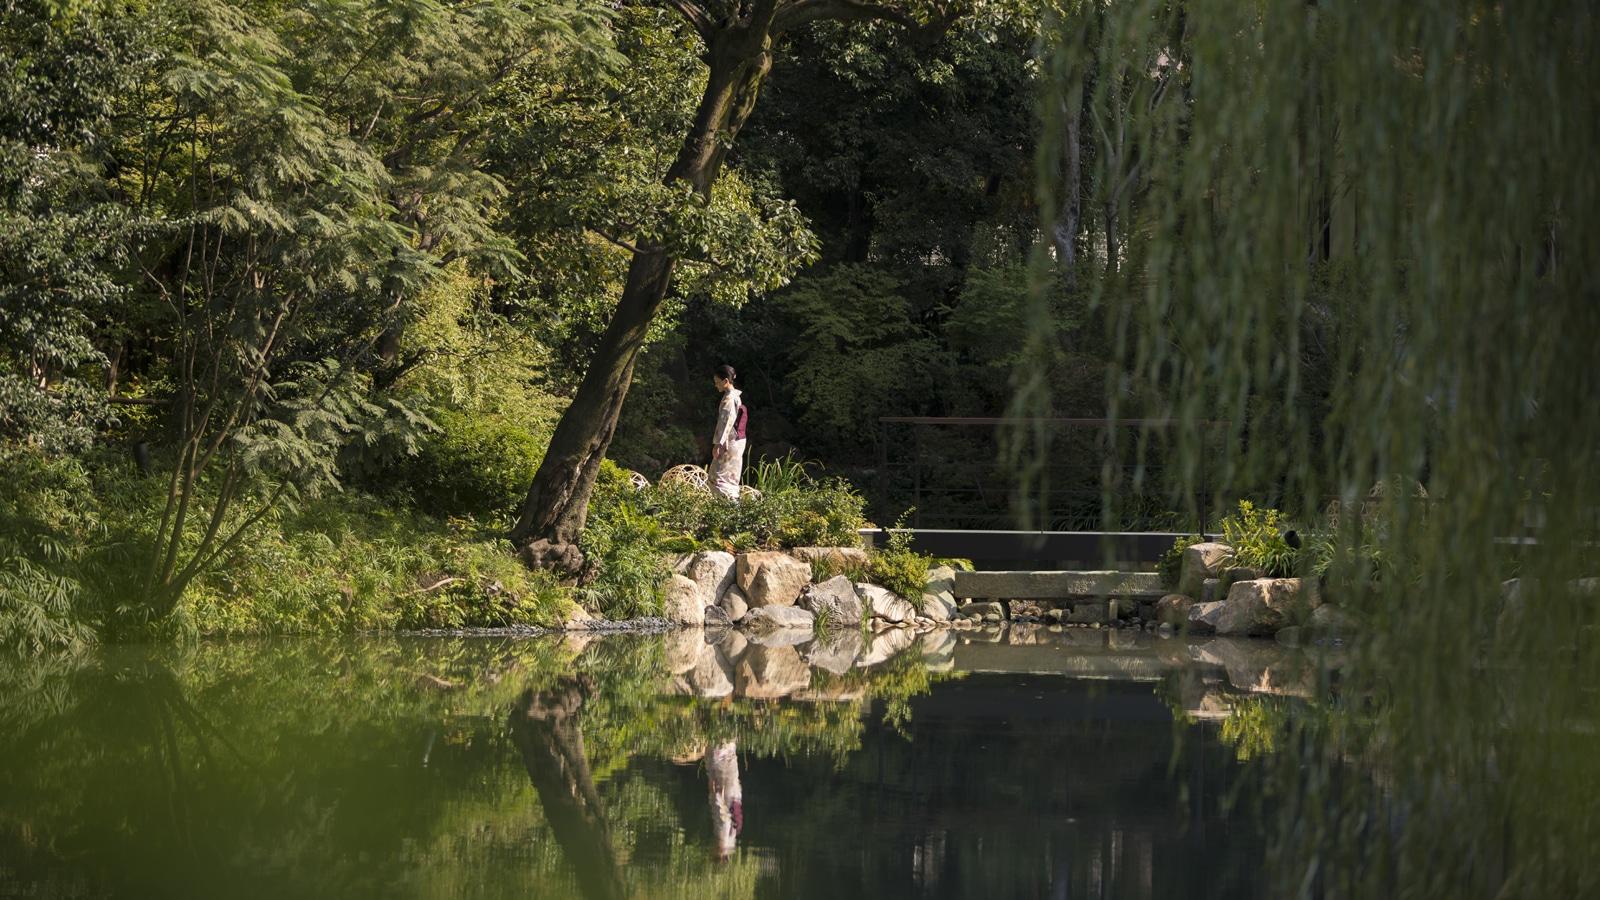 A woman in a kimono crosses a bridge over the pond in Shakusuien garden.